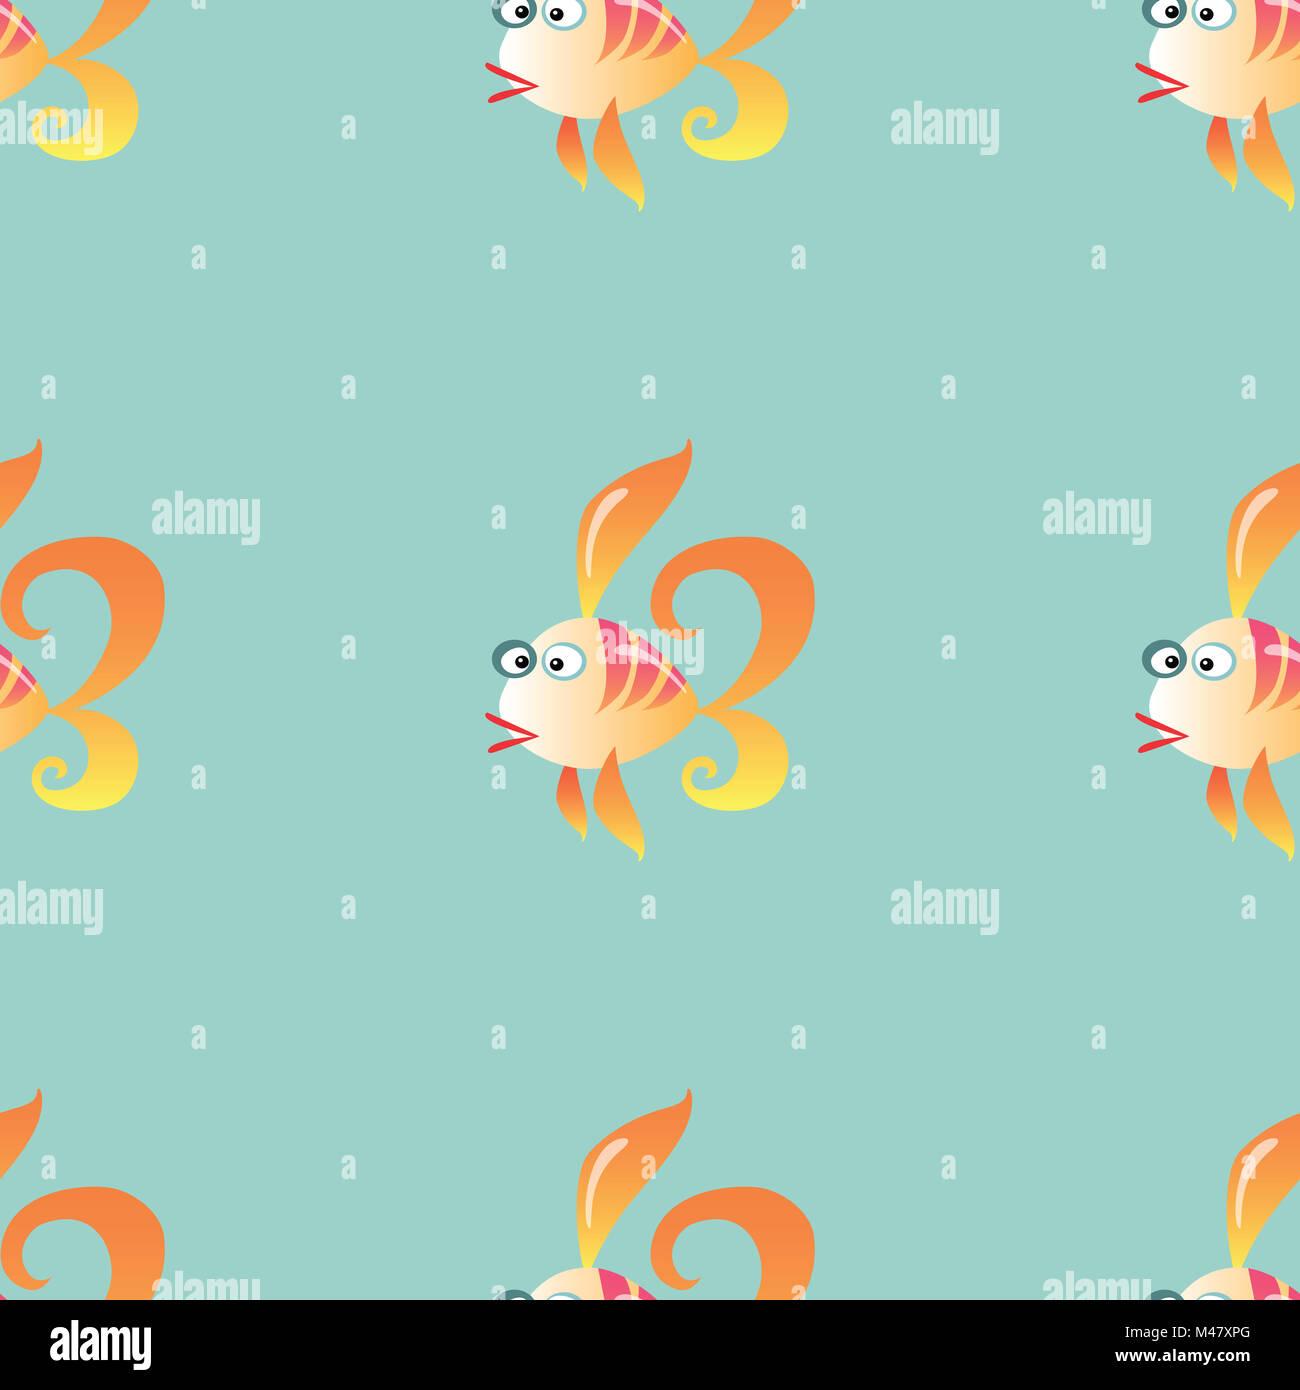 Goldfish marine pattern seamless sfondo Immagini Stock